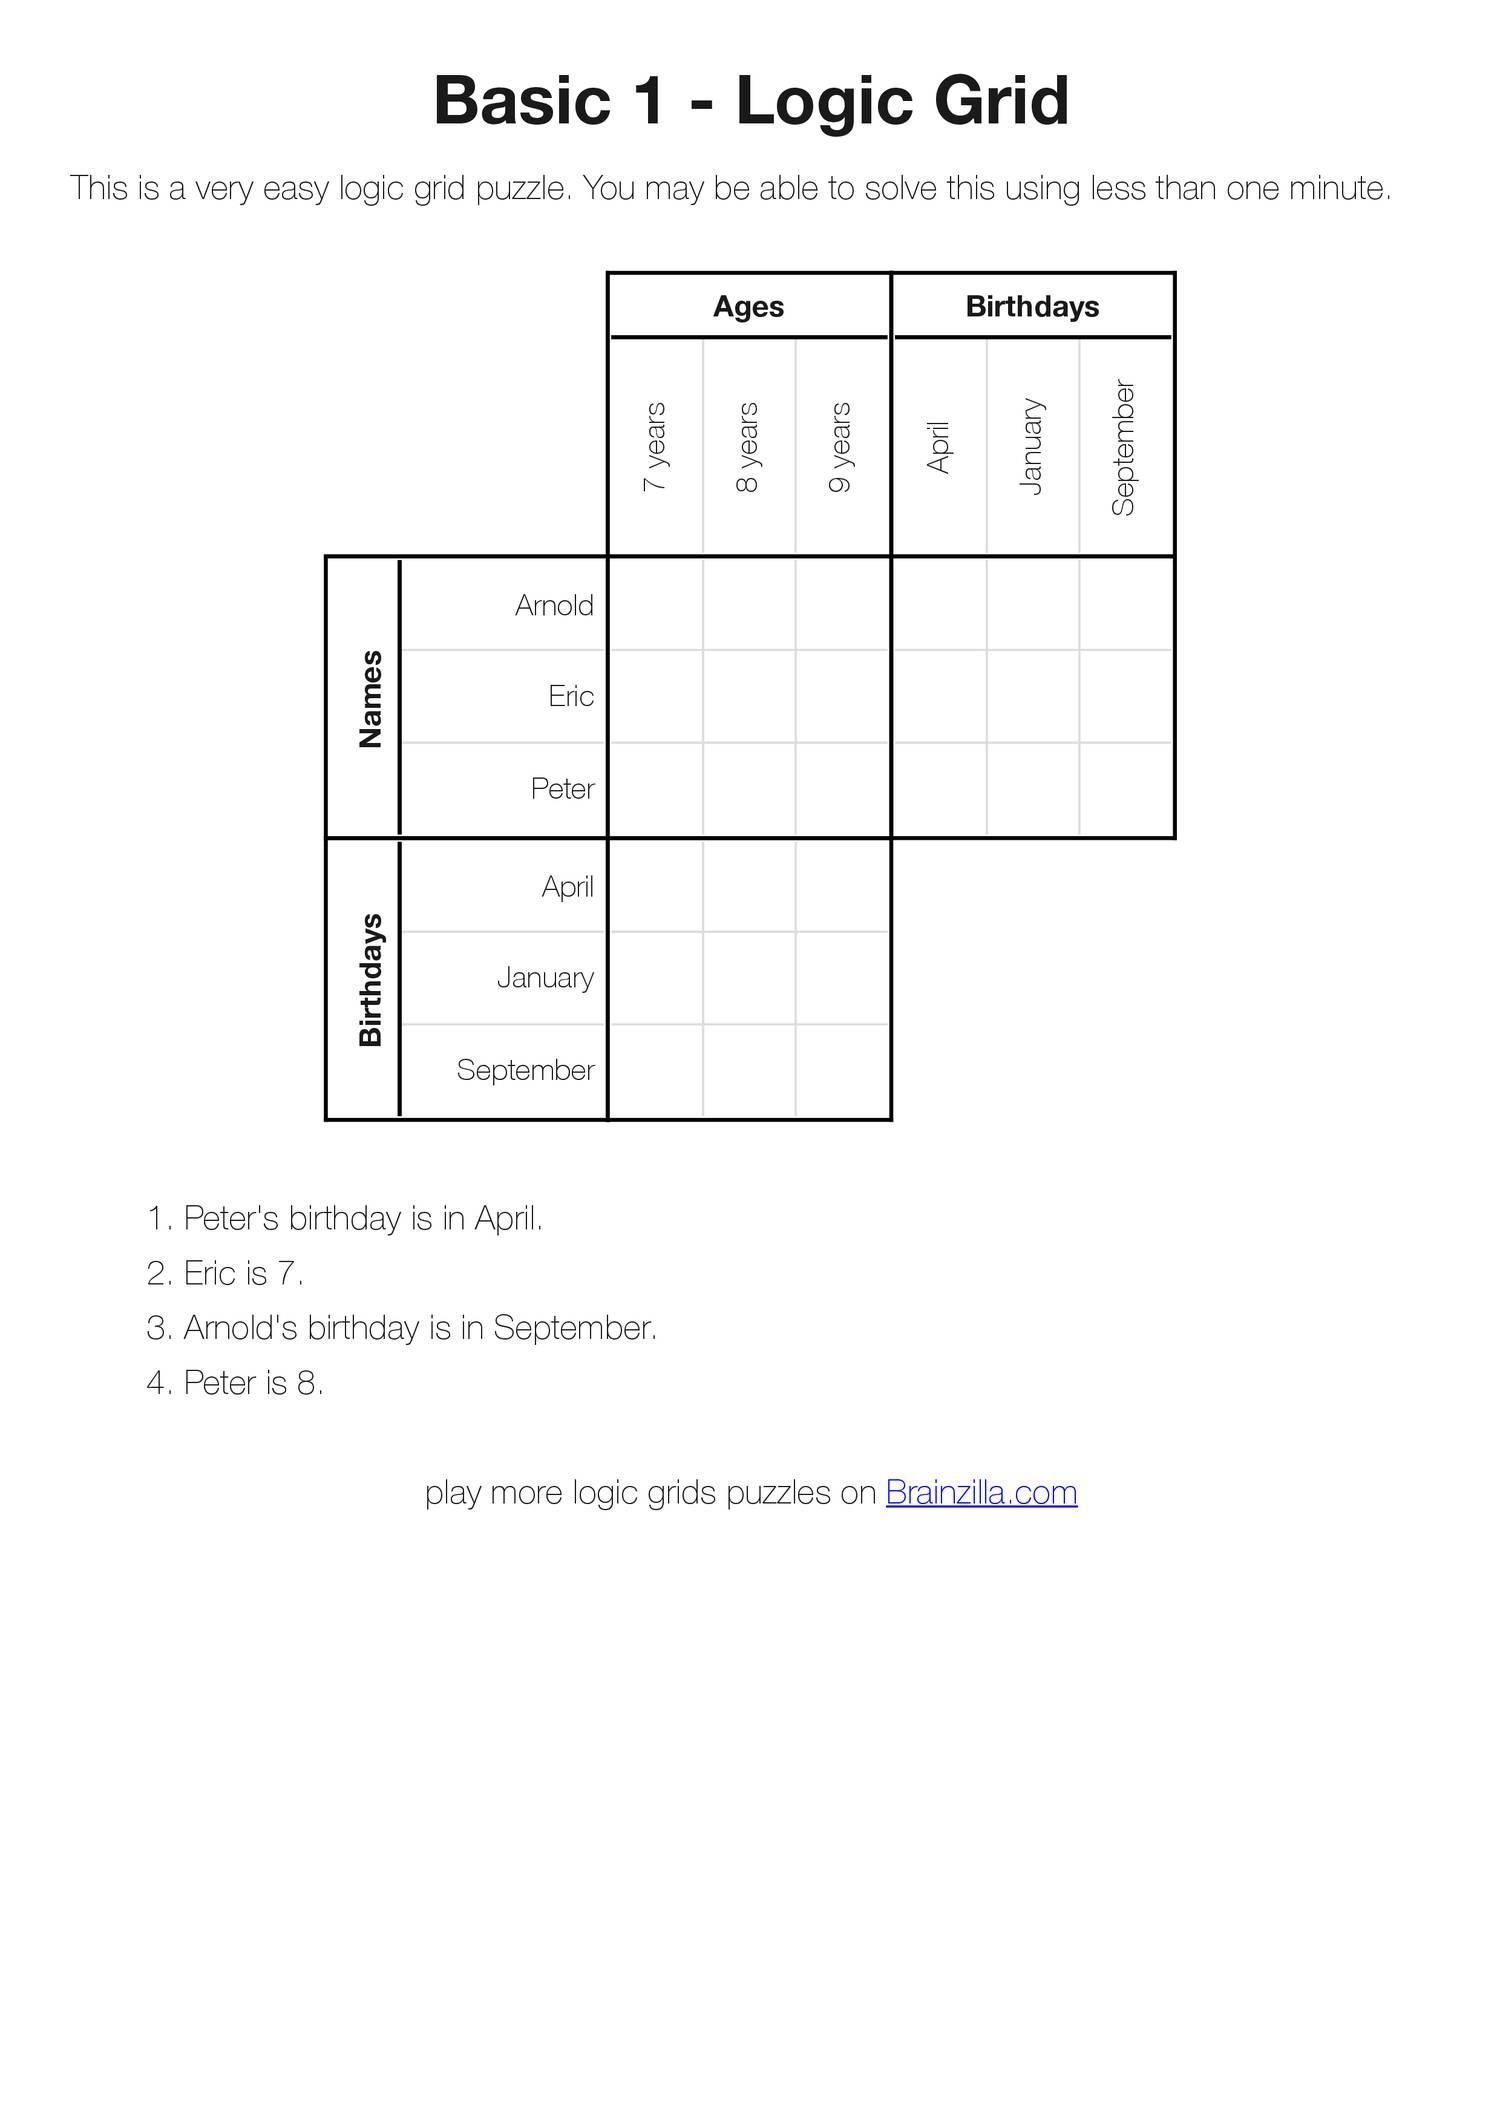 Printable Logic Grid Puzzles (Brainzilla).pdf   Docdroid - Printable Logic Puzzles Pdf